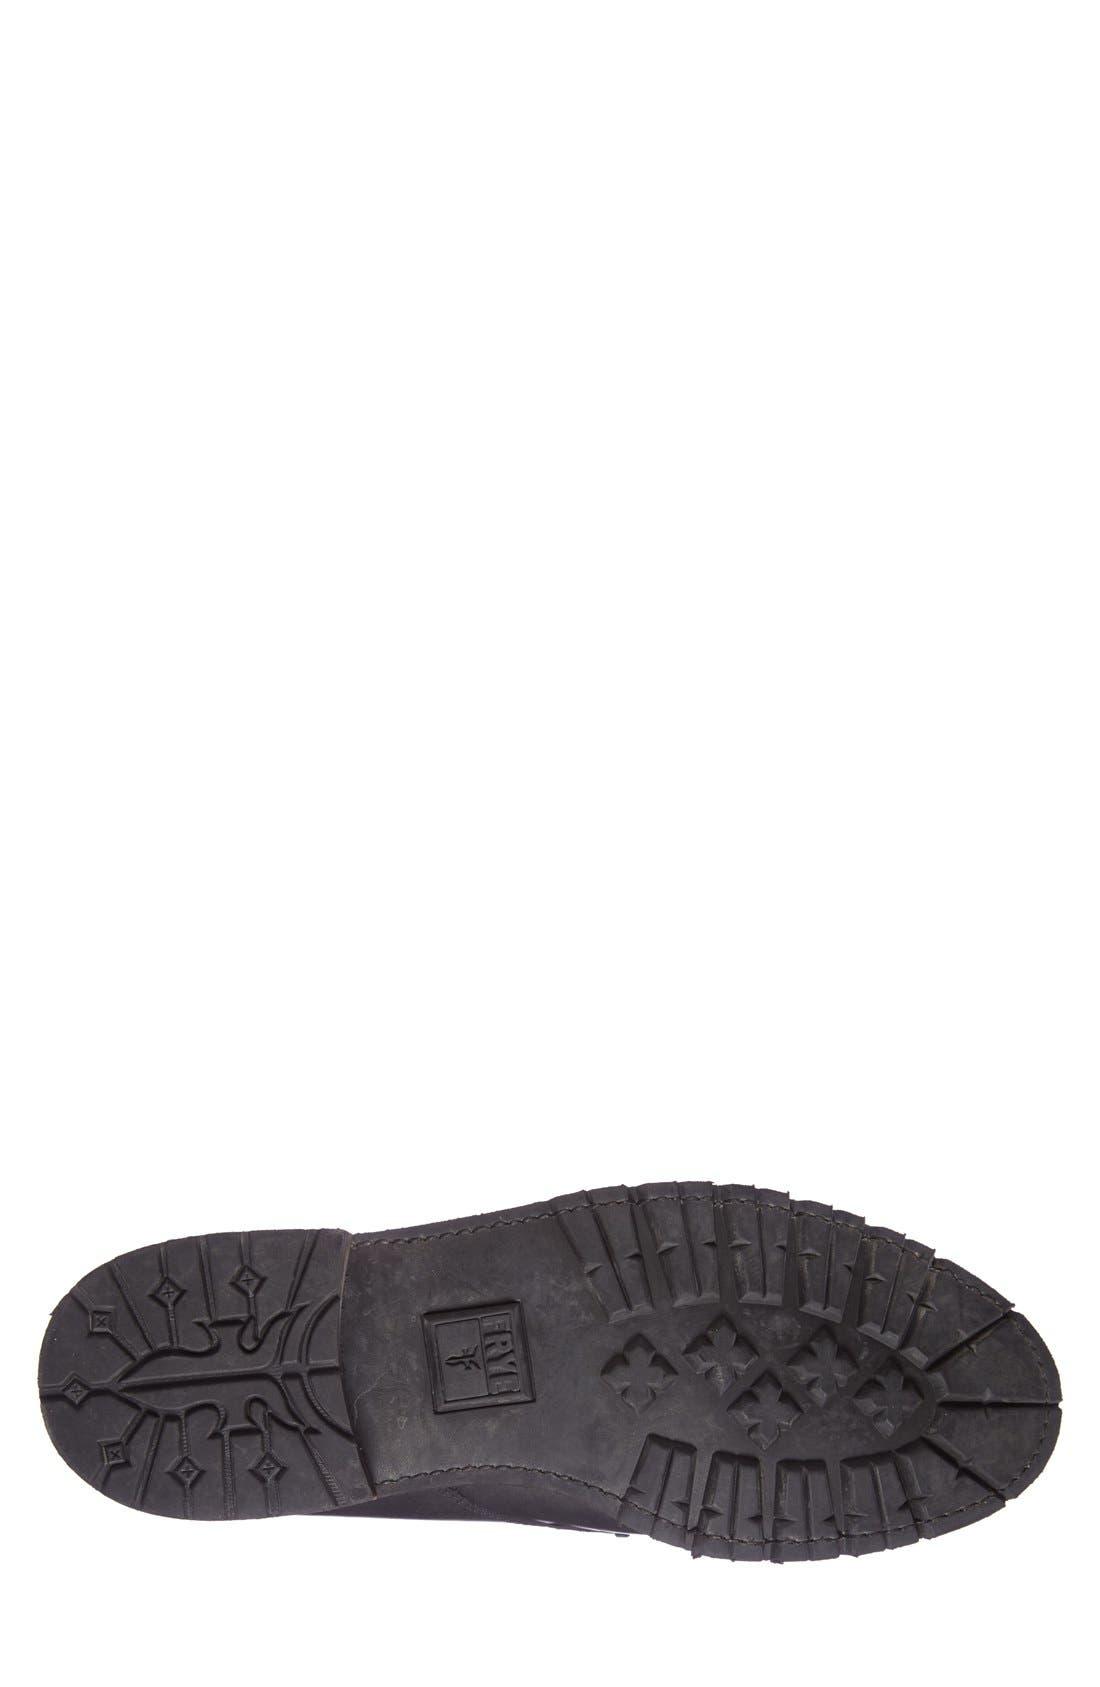 Alternate Image 4  - Frye 'James' Lug Sole Chukka Boot (Men)